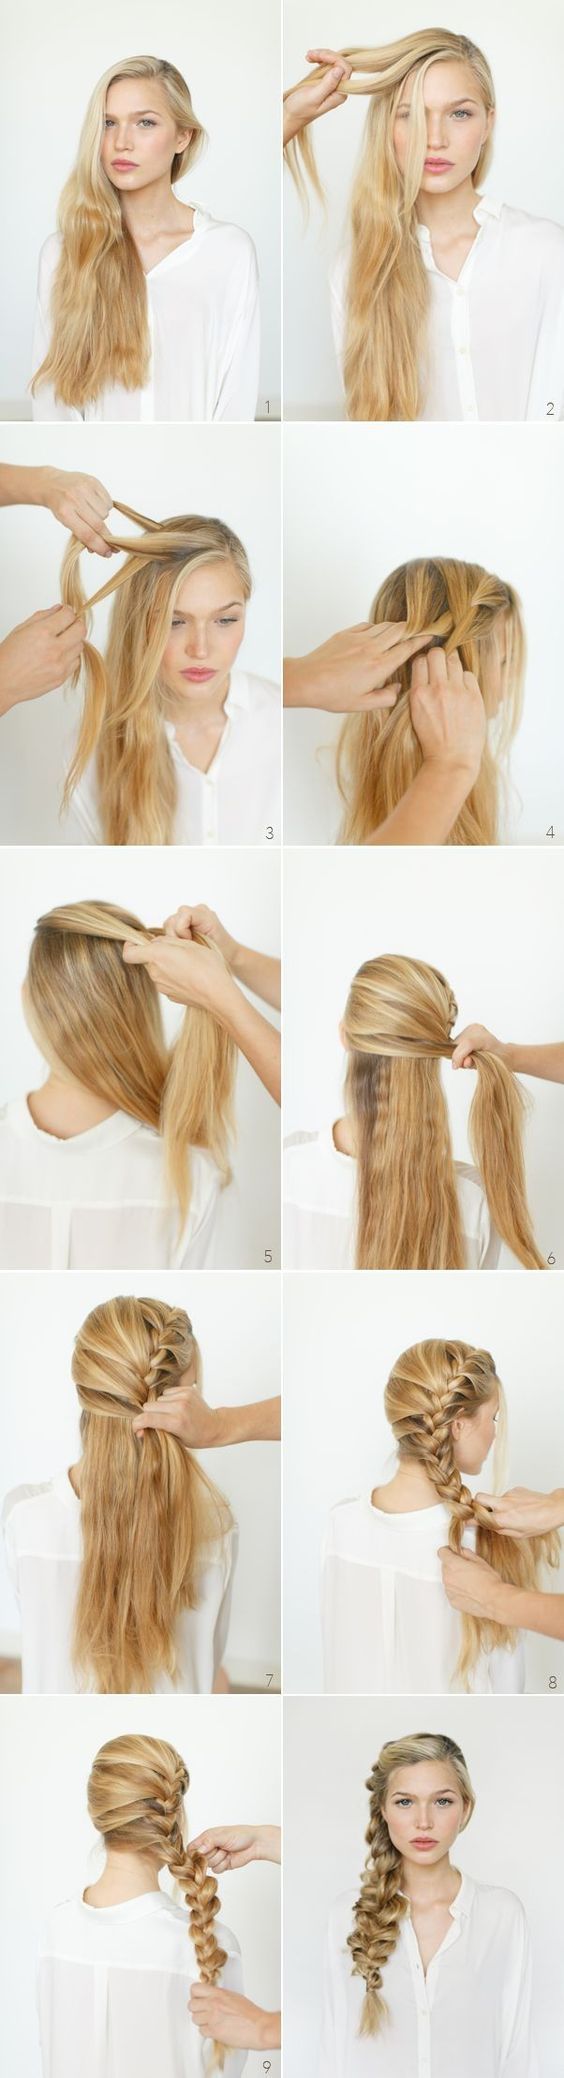 20 Fashionable Step By Step Hairstyle Tutorials Tutorials Hair